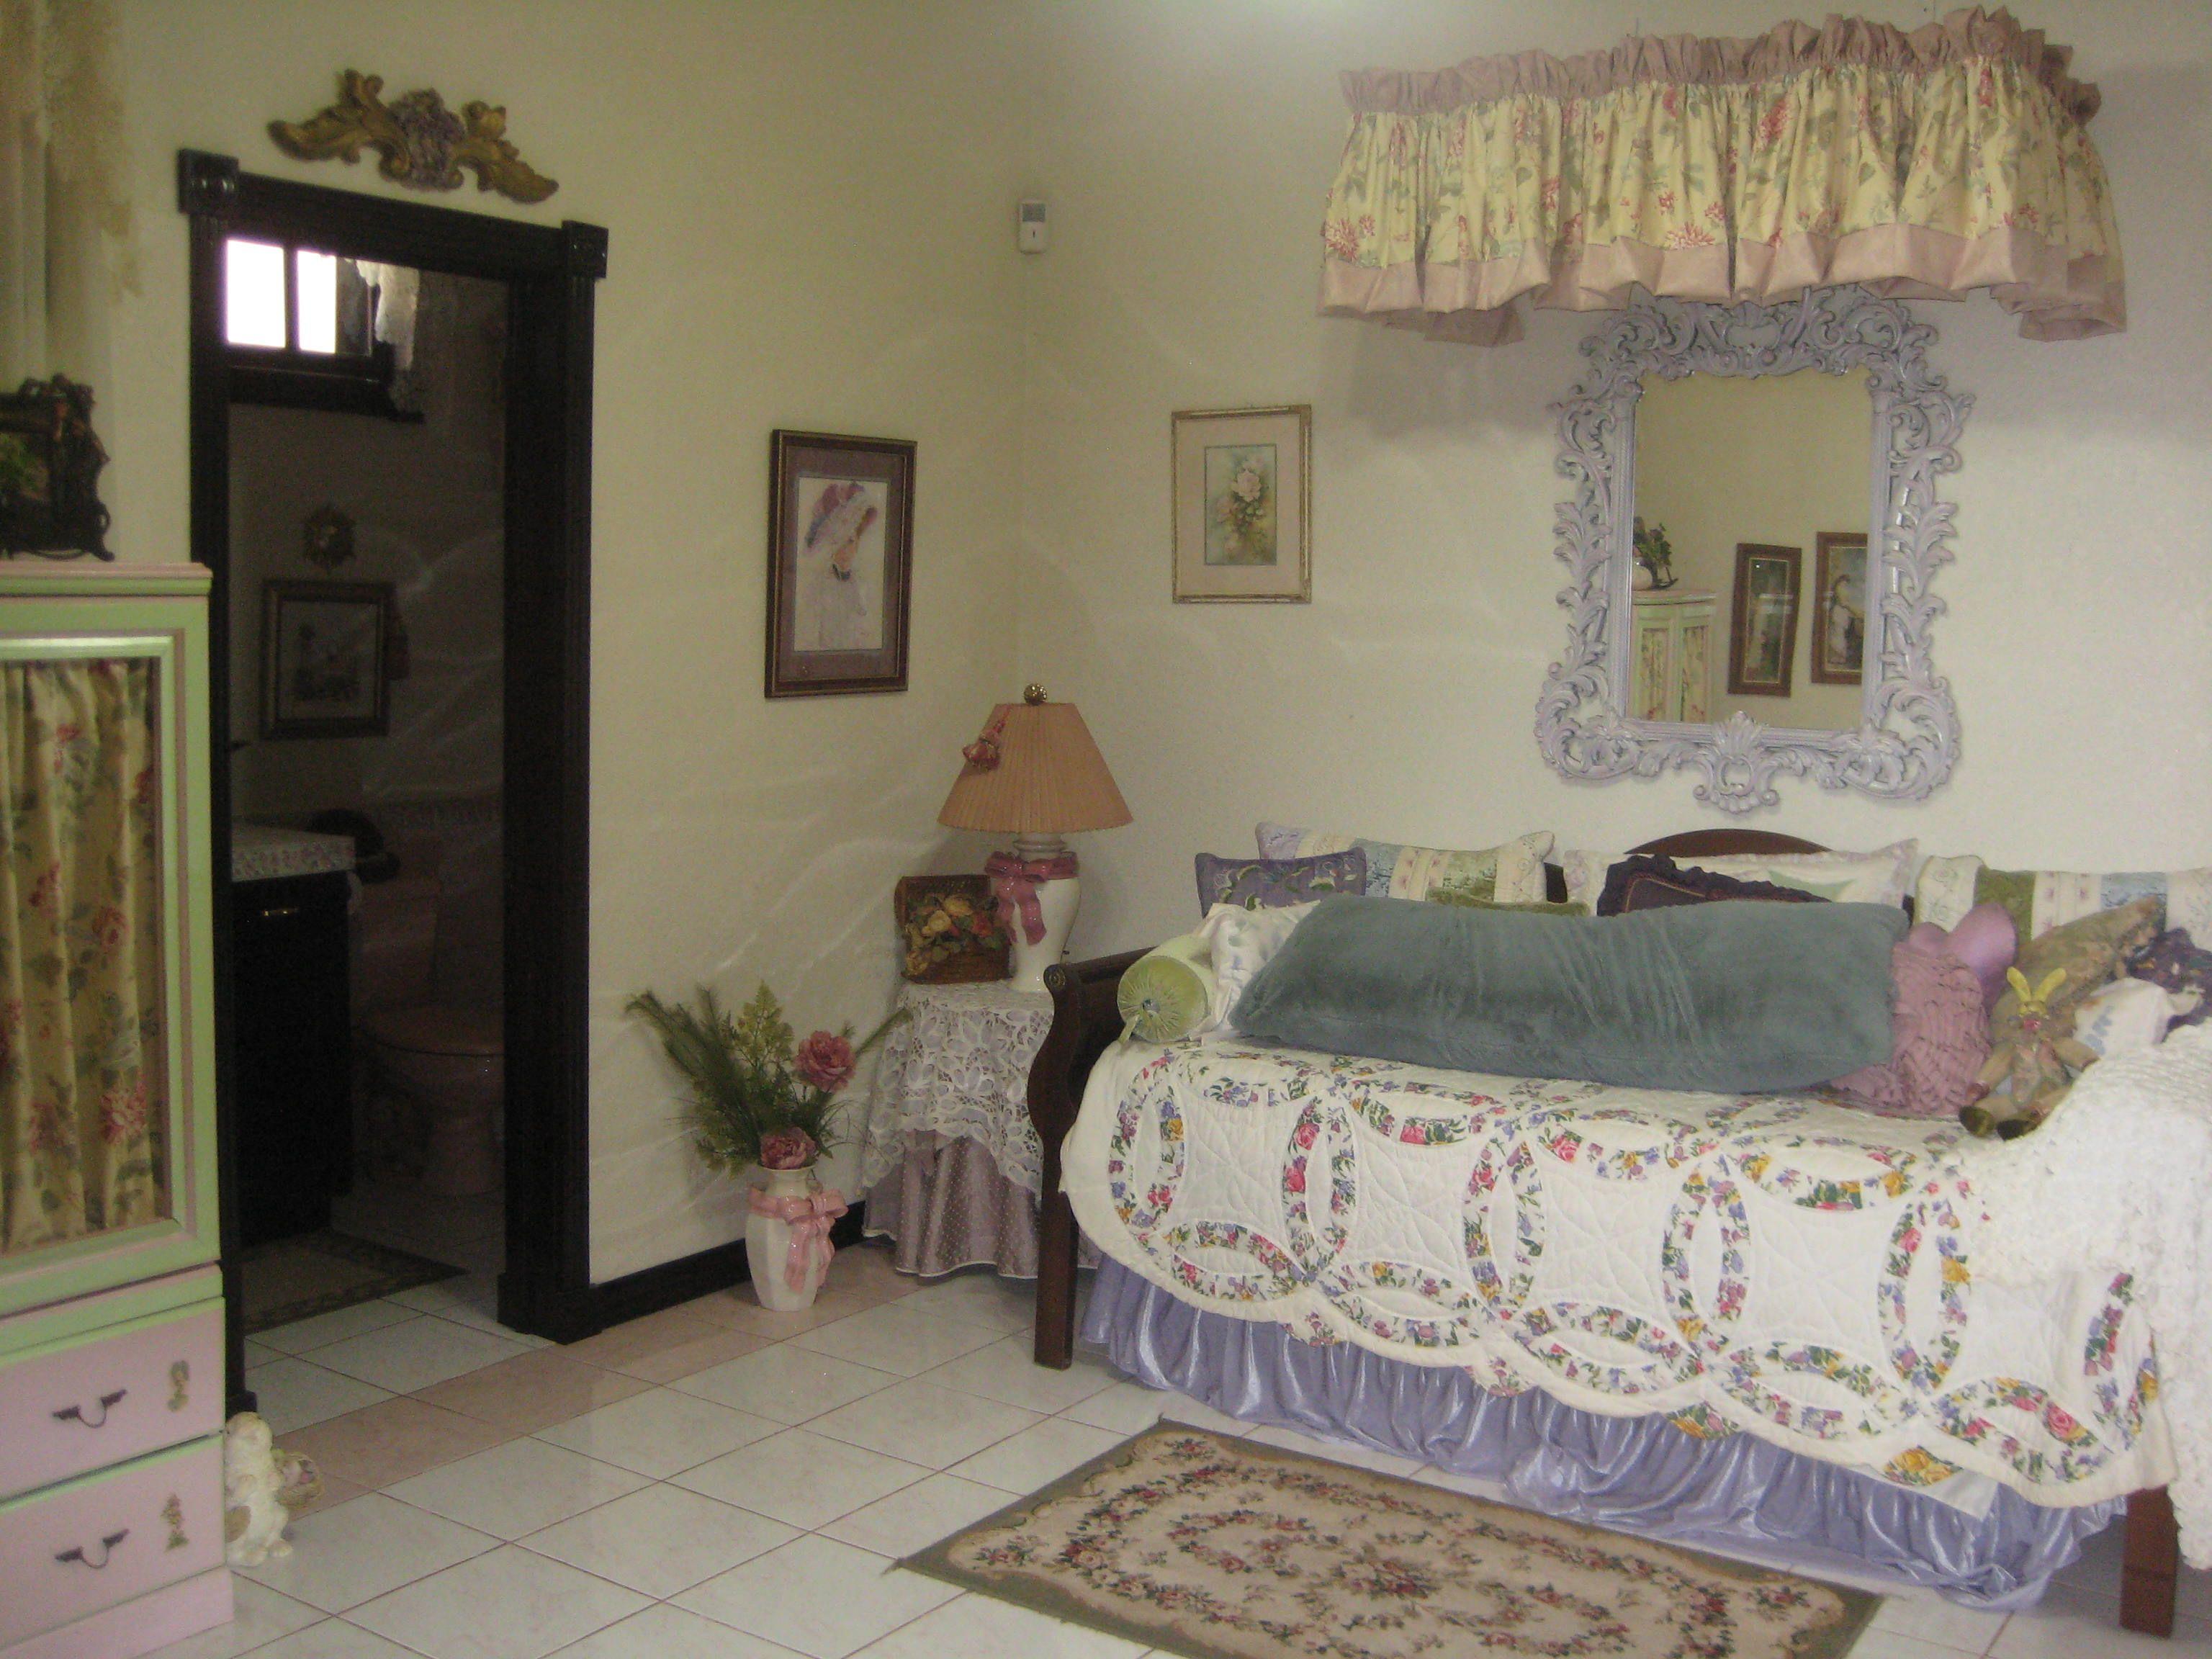 http://ackermanrealtyinternational.com/property/cuidad-colon-home/ ... #CostaRicaLuxuryRealEstate - Costa Rica Luxury Real Estate #BuyCostaRicaLuxuryRealEstate - Buy Costa Rica Luxury Real Estate